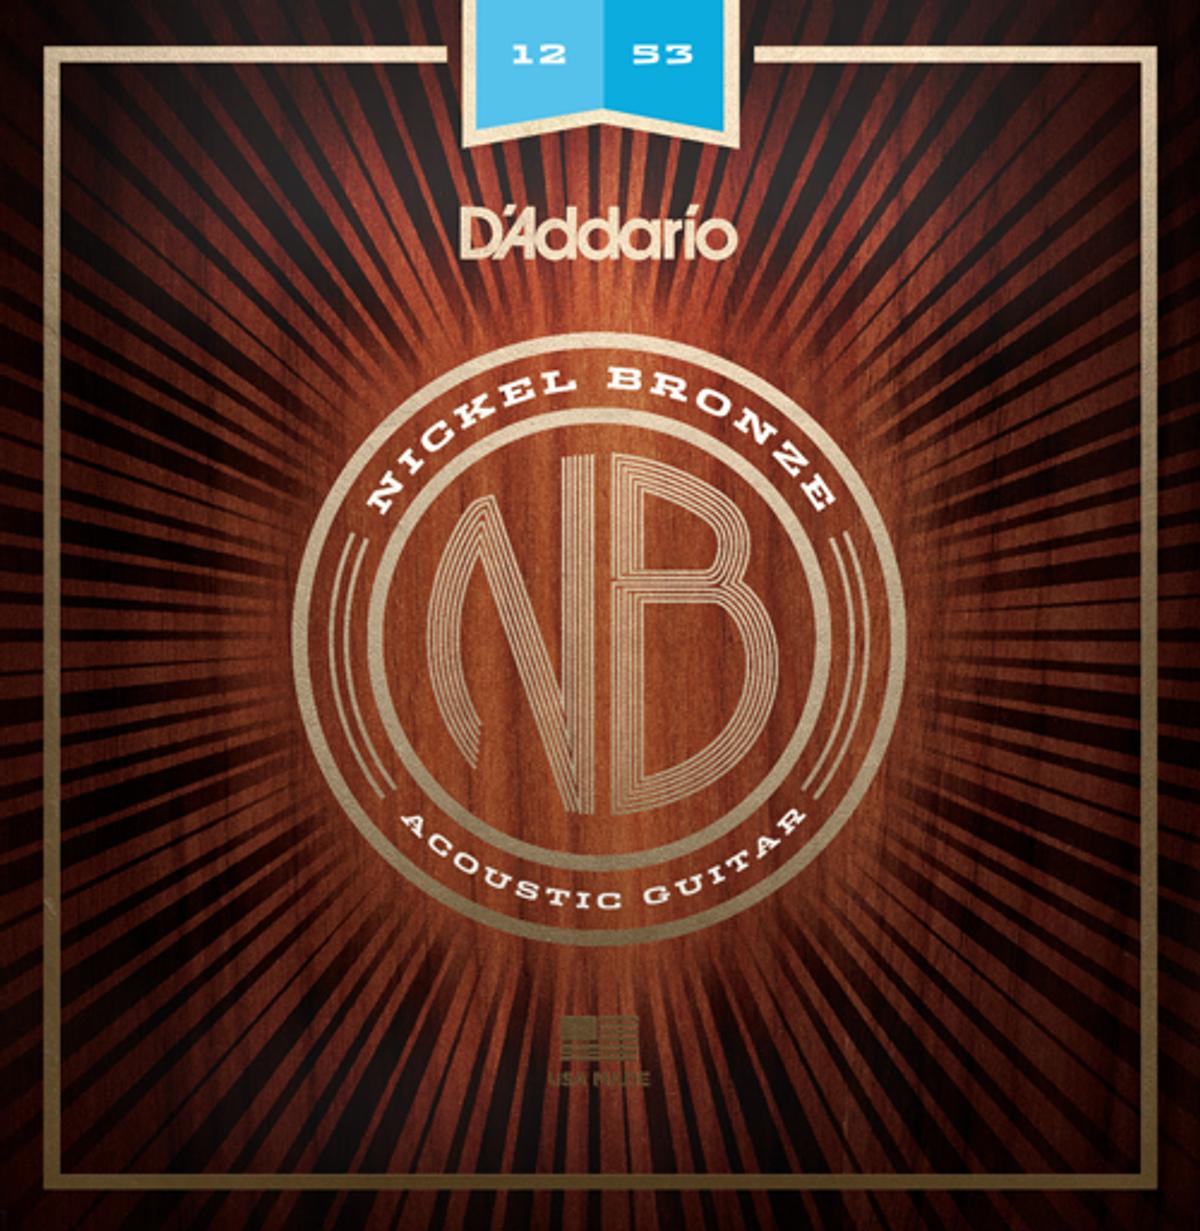 D'Addario Announces Nickel Bronze Acoustic Guitar Strings